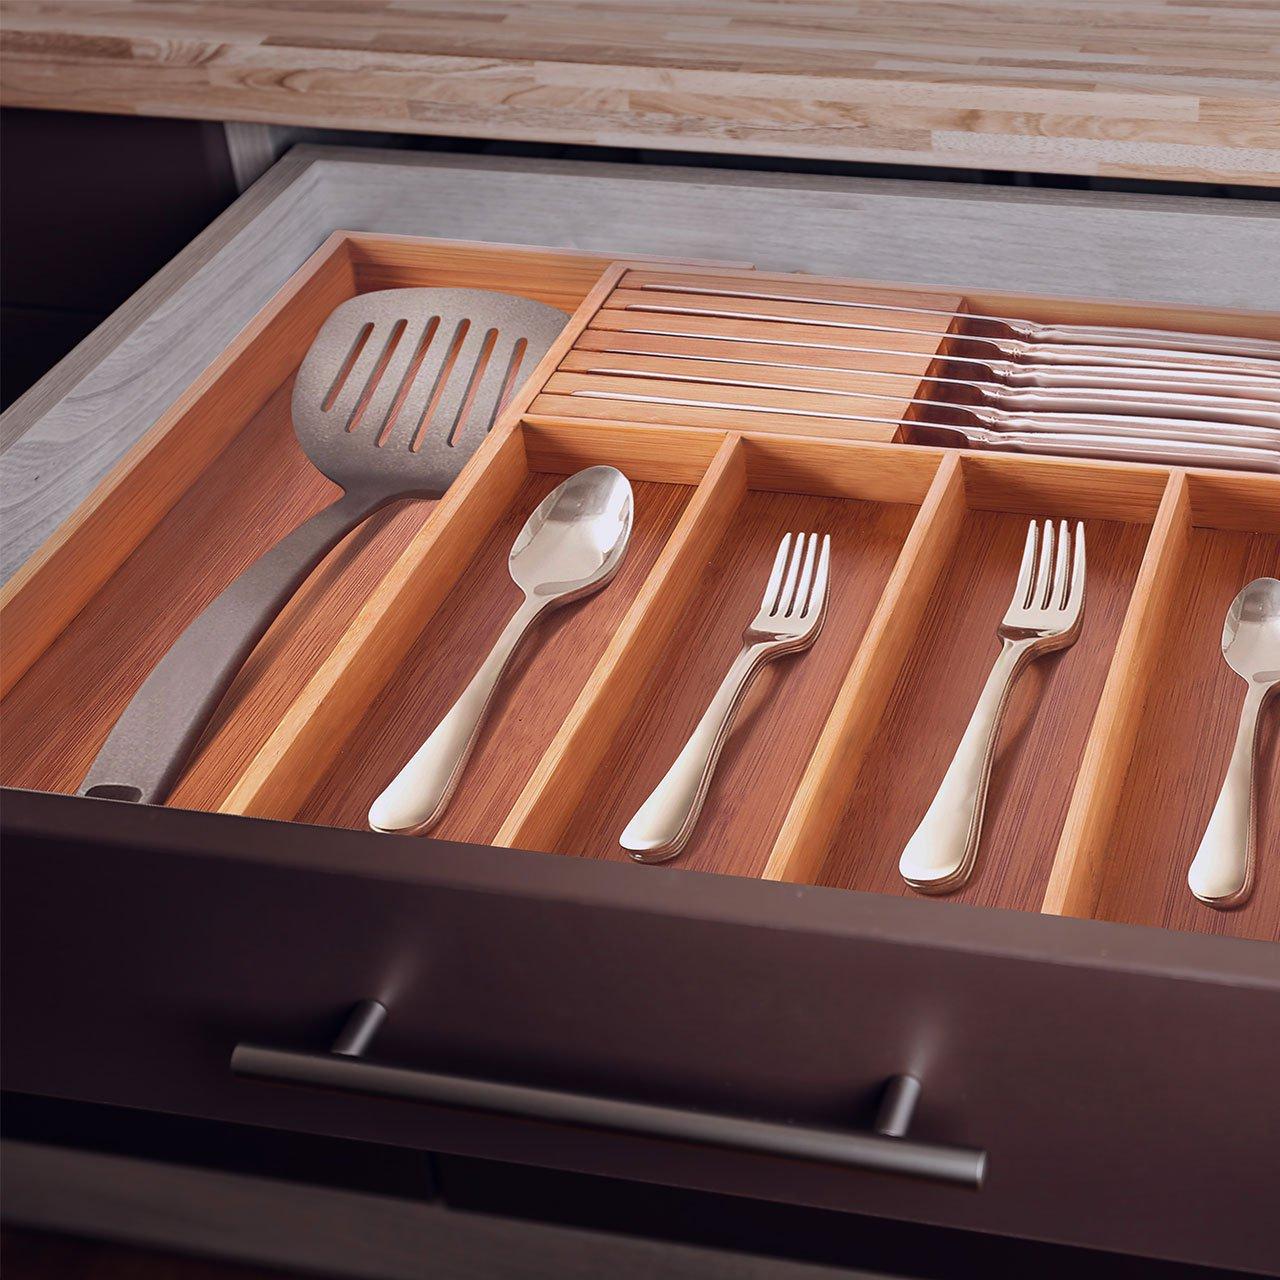 Utensil Drawer Organizer Bamboo Flatware Organizer Expandable Kitchen Silverware Organizer Cutlery Tray